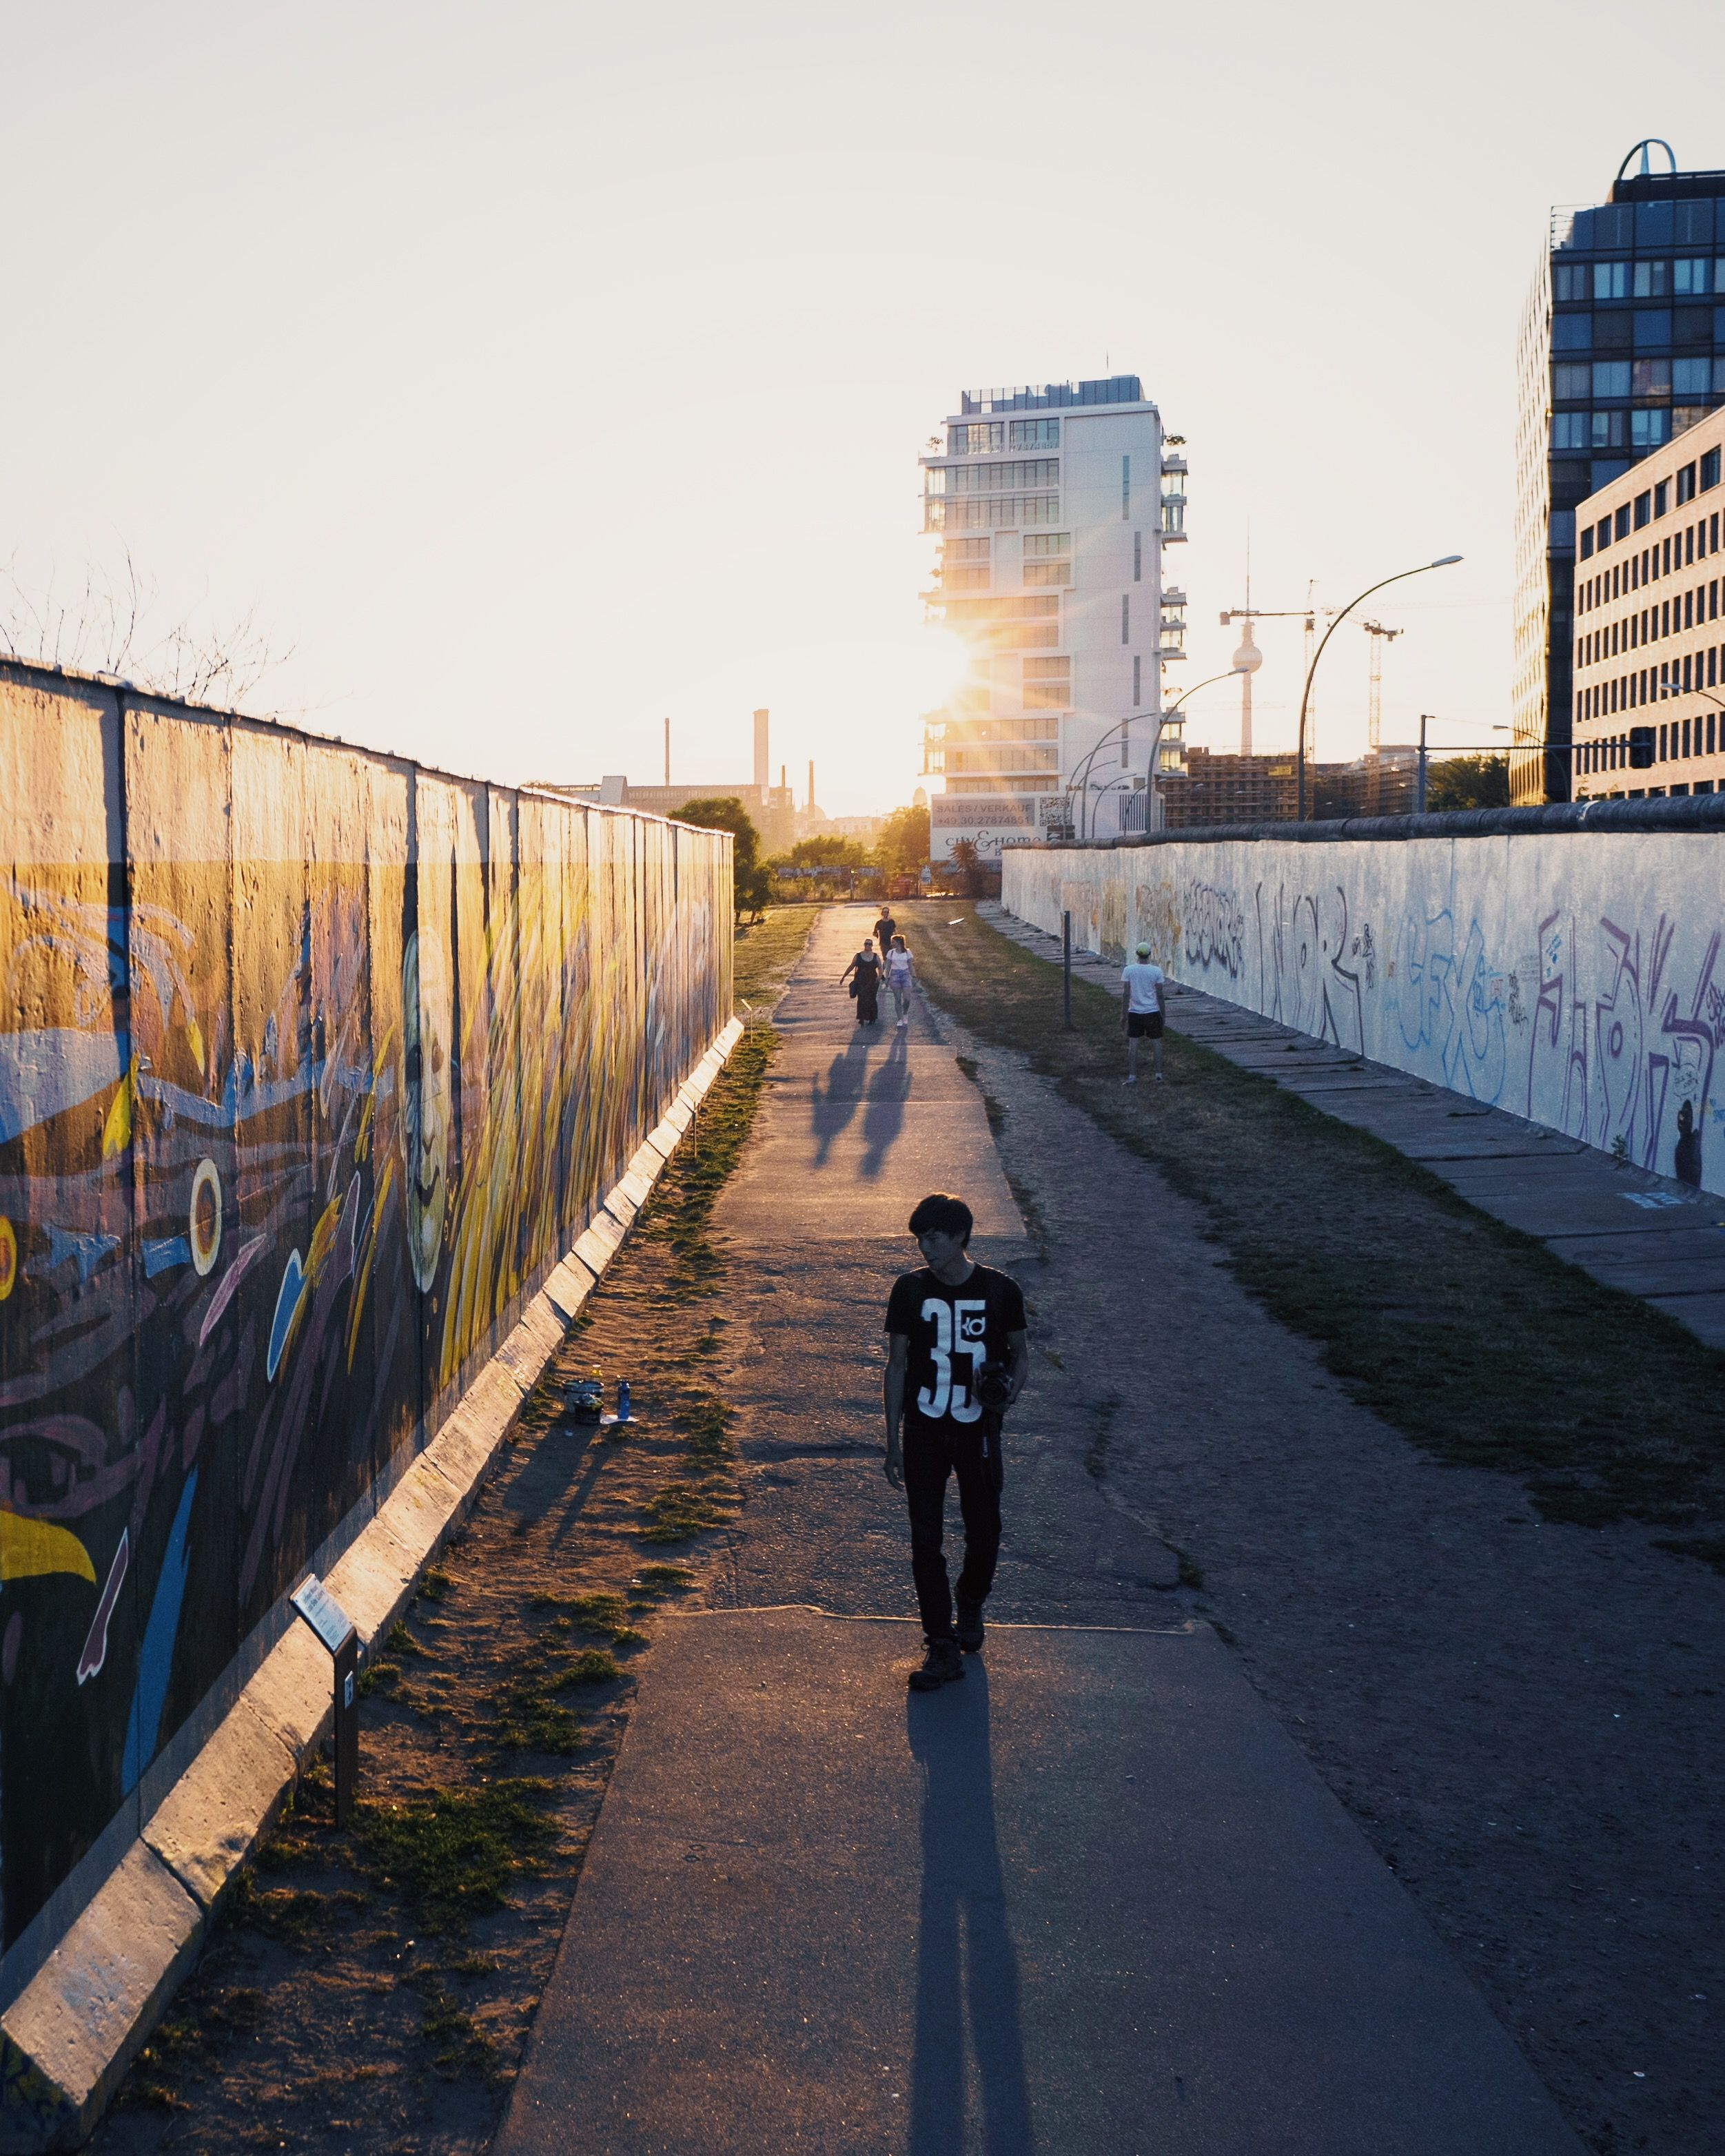 between the walls - East Side Gallery  #eastsidegallery #Berlin Joerg Nicht